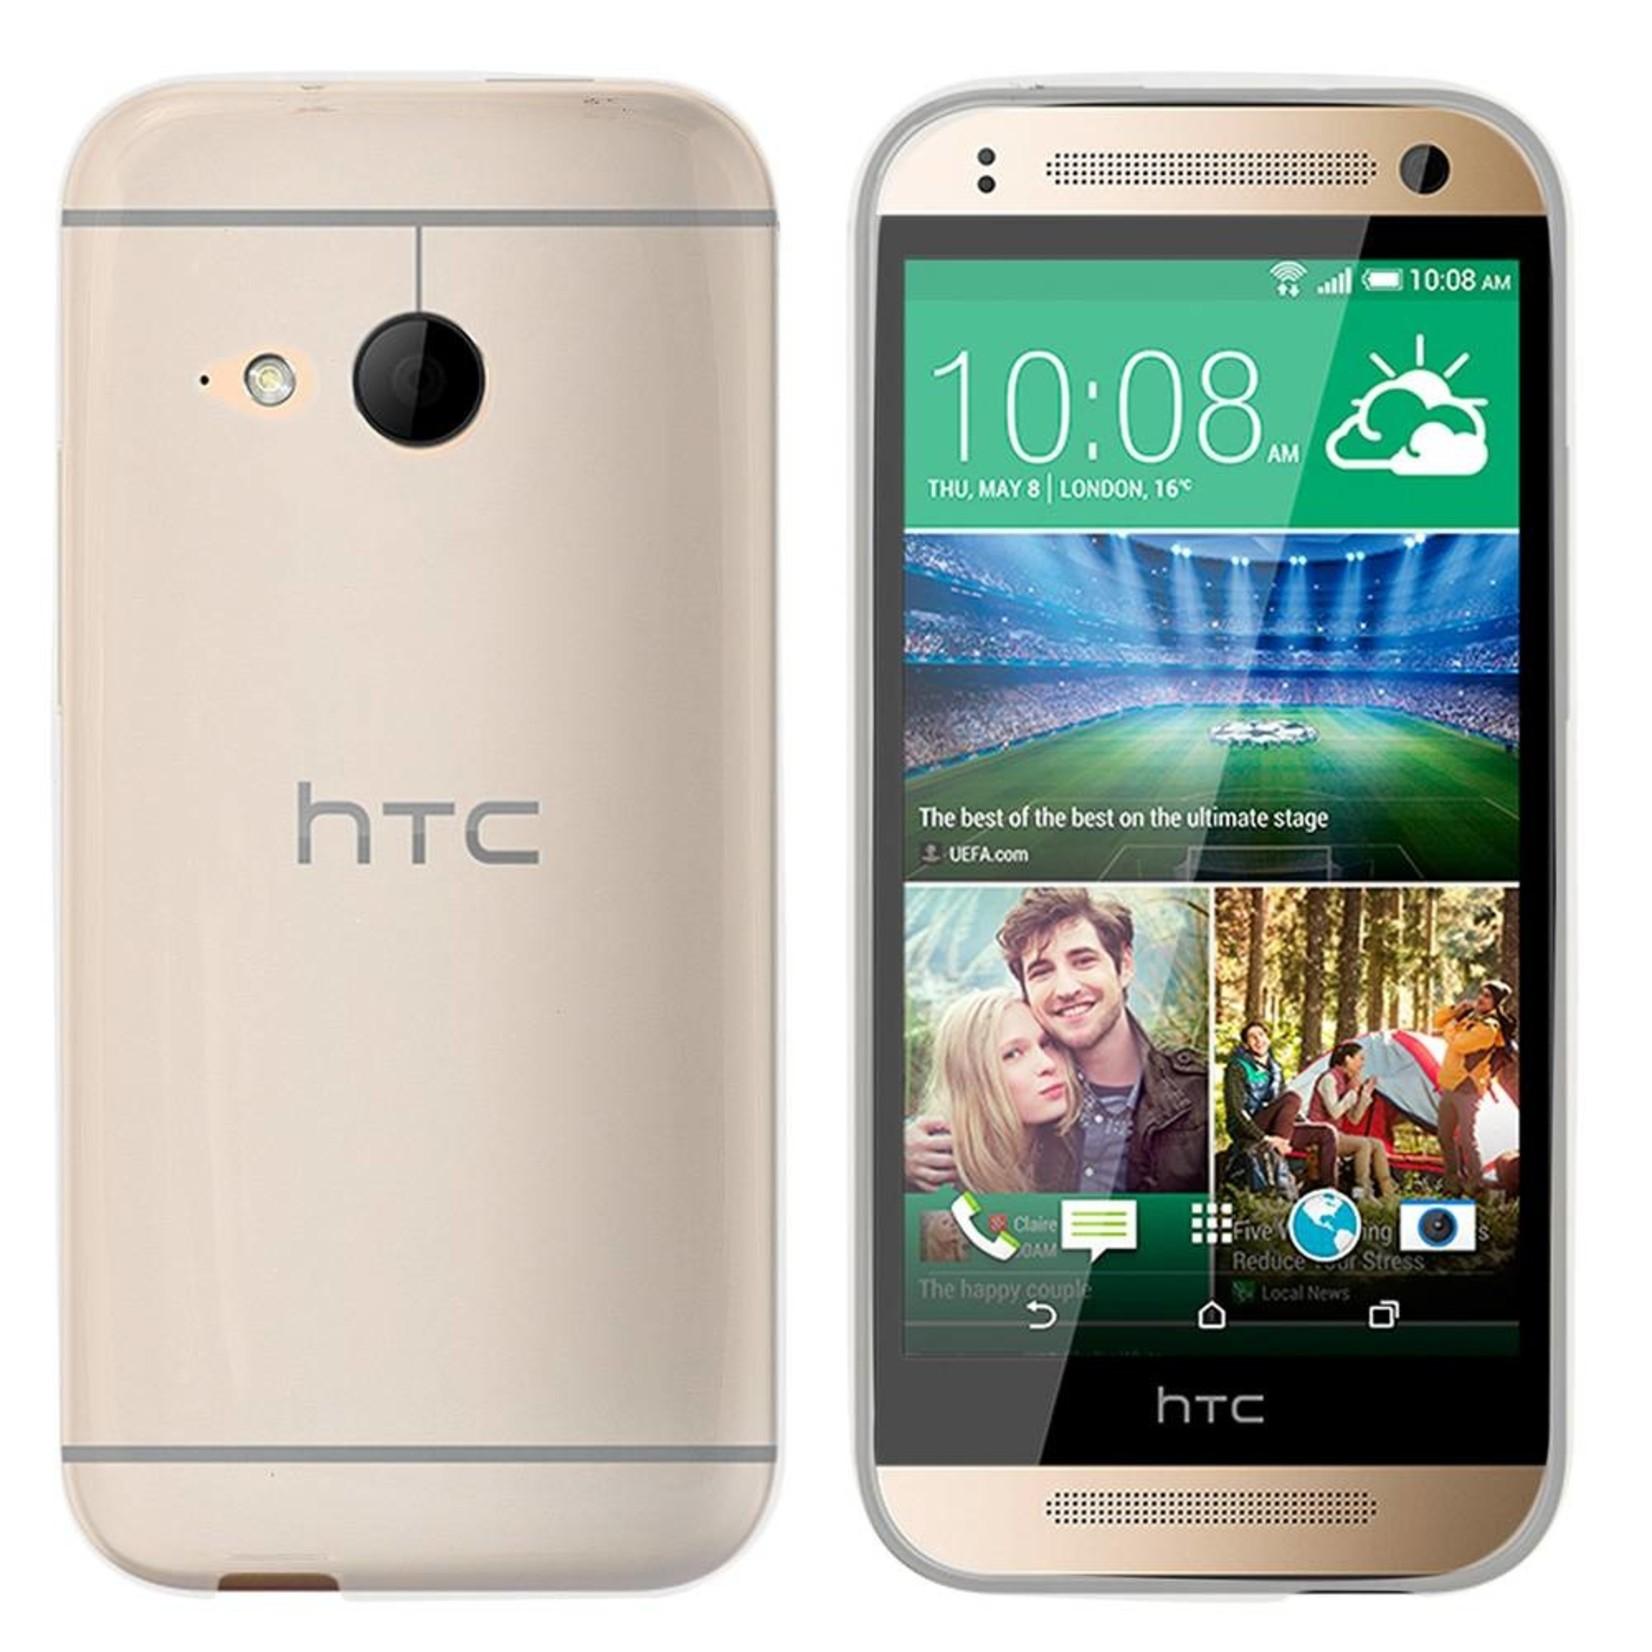 Colorfone Hoesje CoolSkin3T voor HTC X9 Tr. Wit